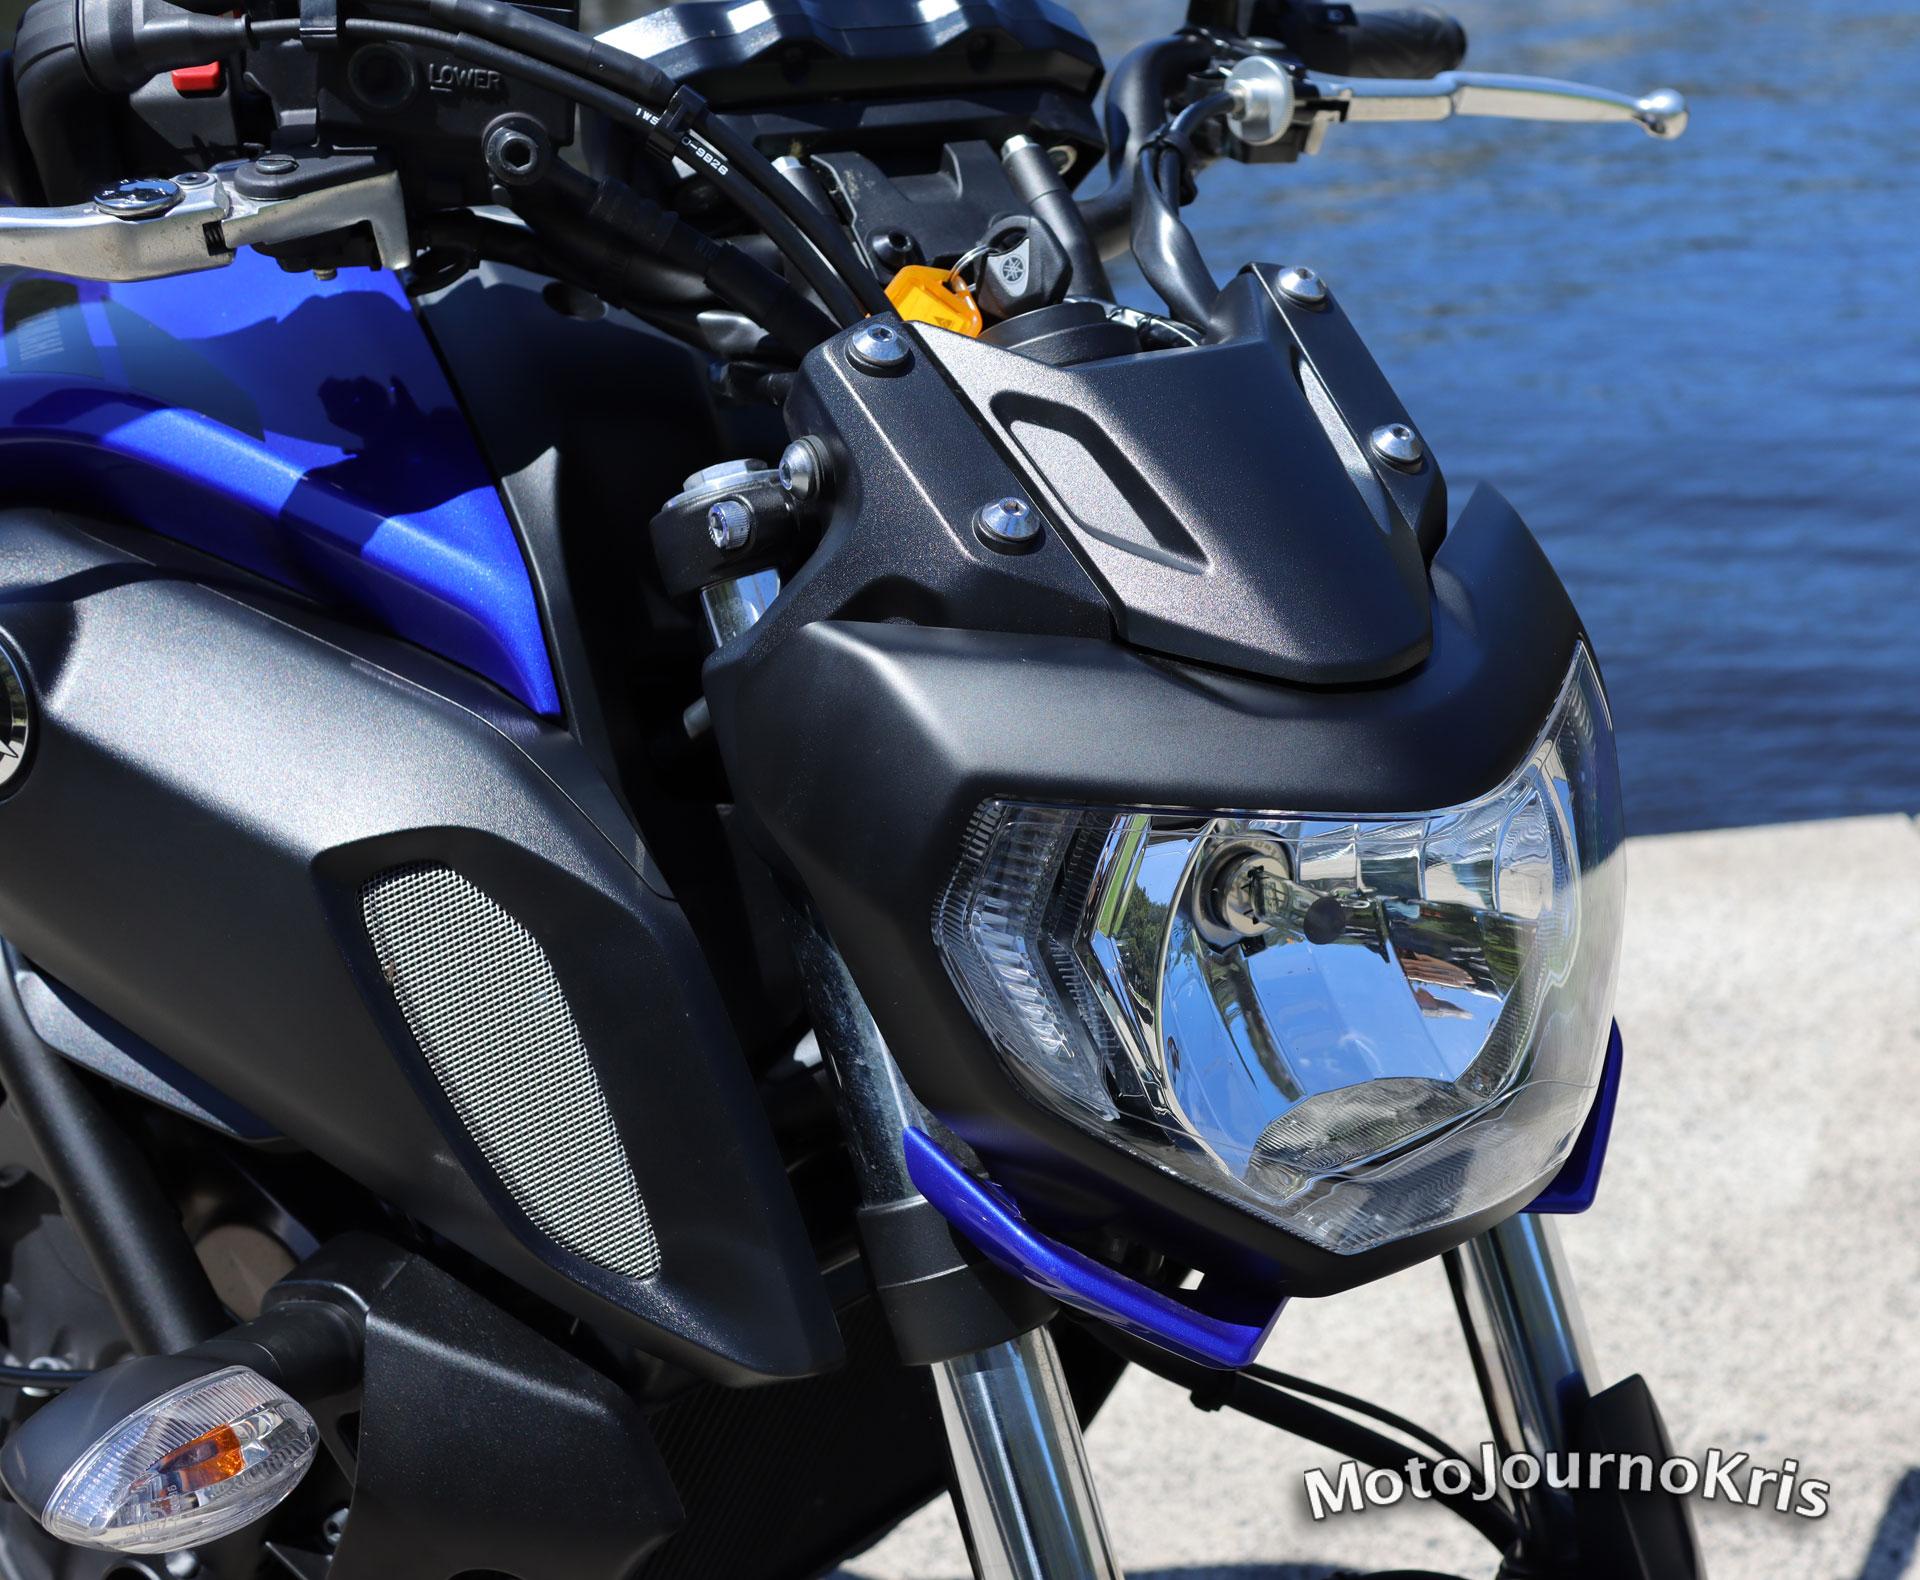 Yamaha MT-07 stock headlight